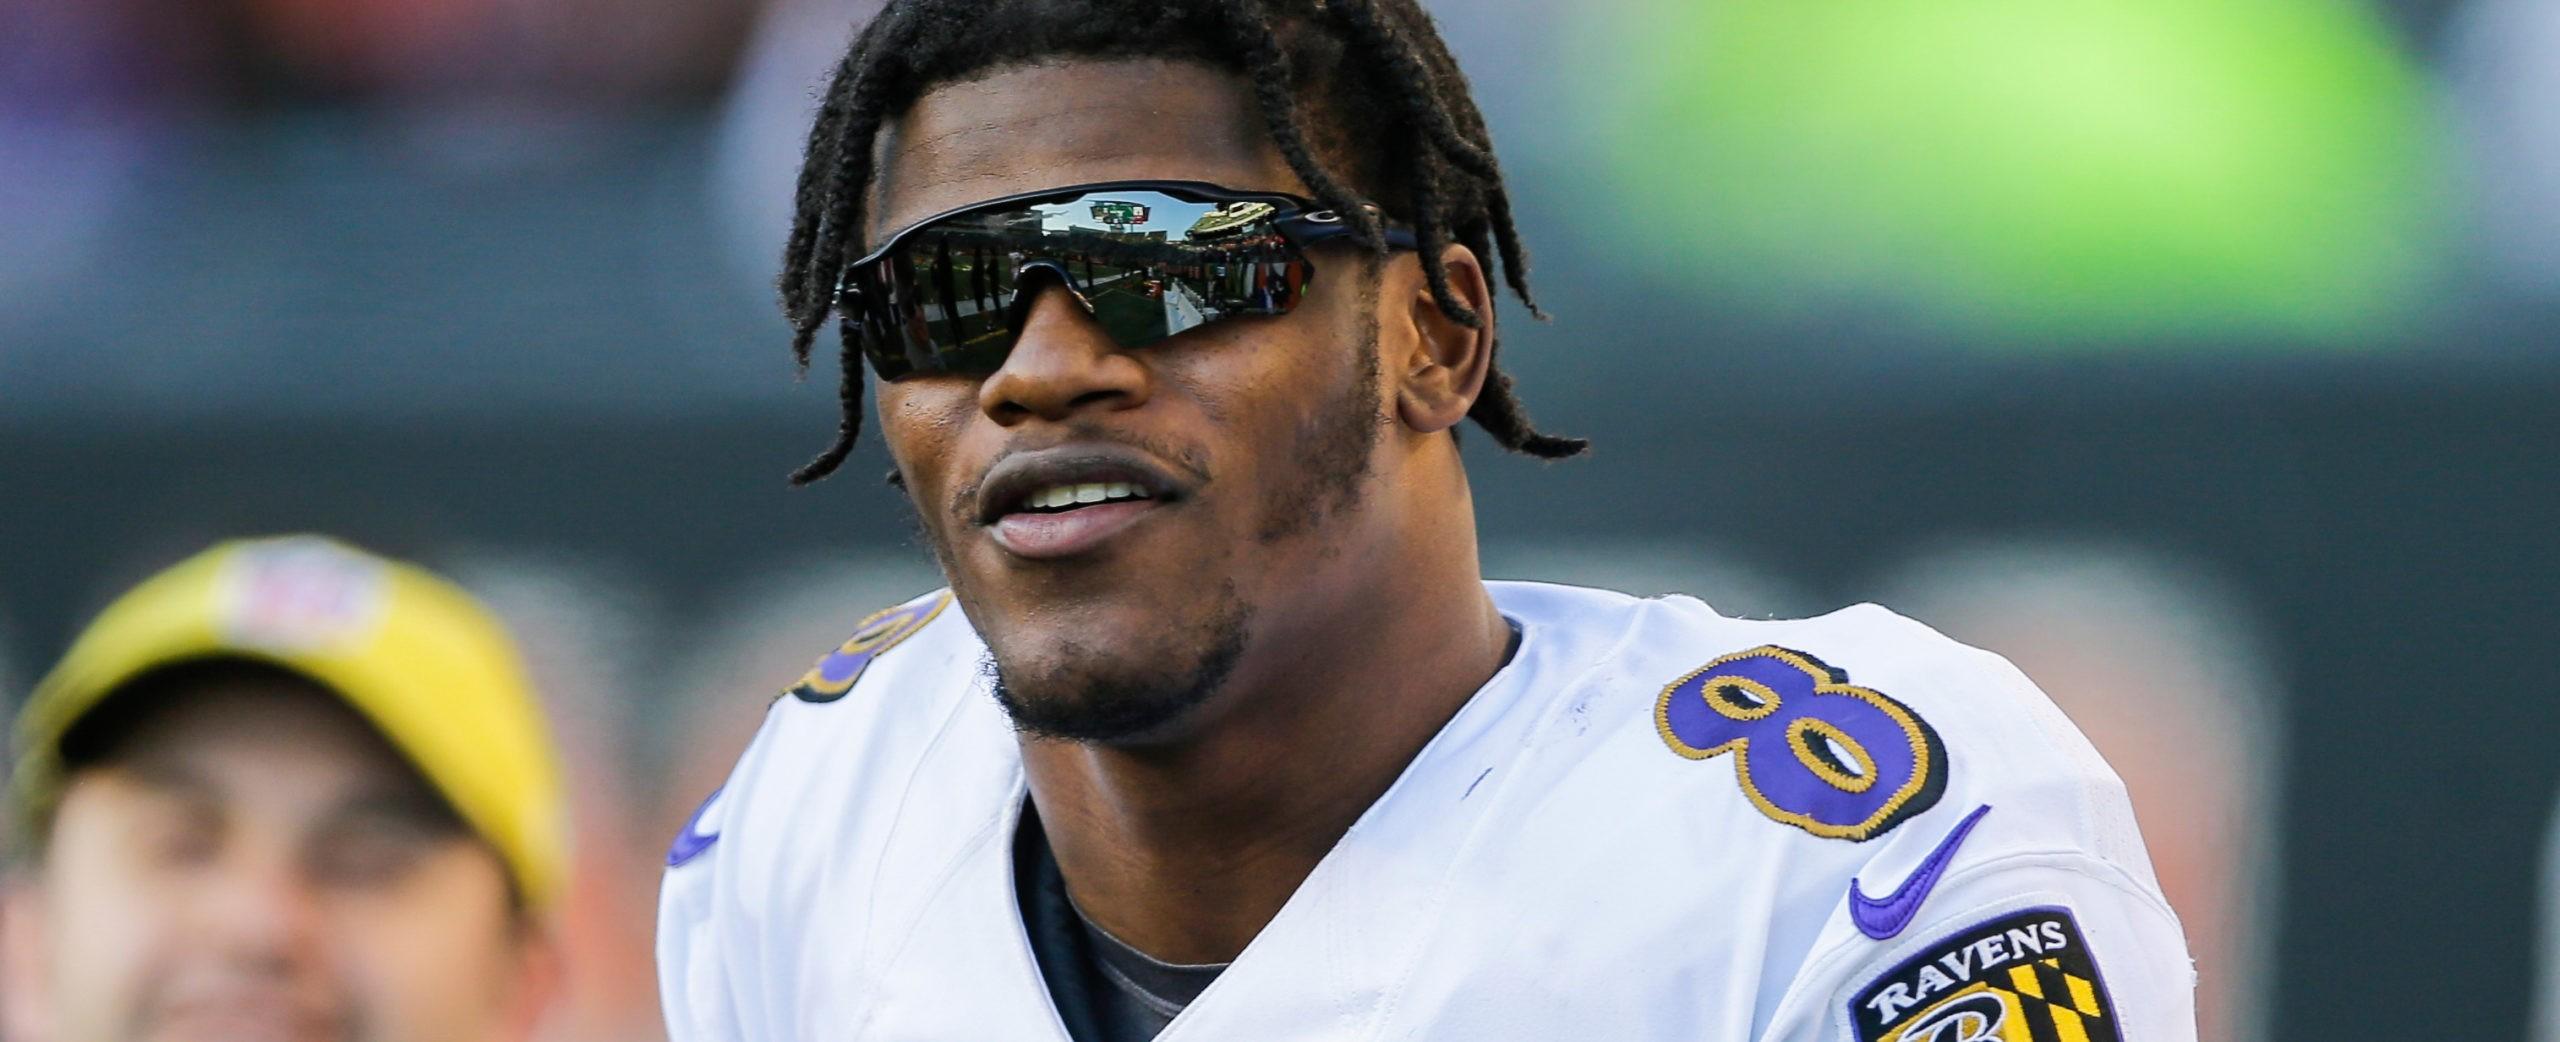 Lamar Jackson quarterback för Baltimore Ravens